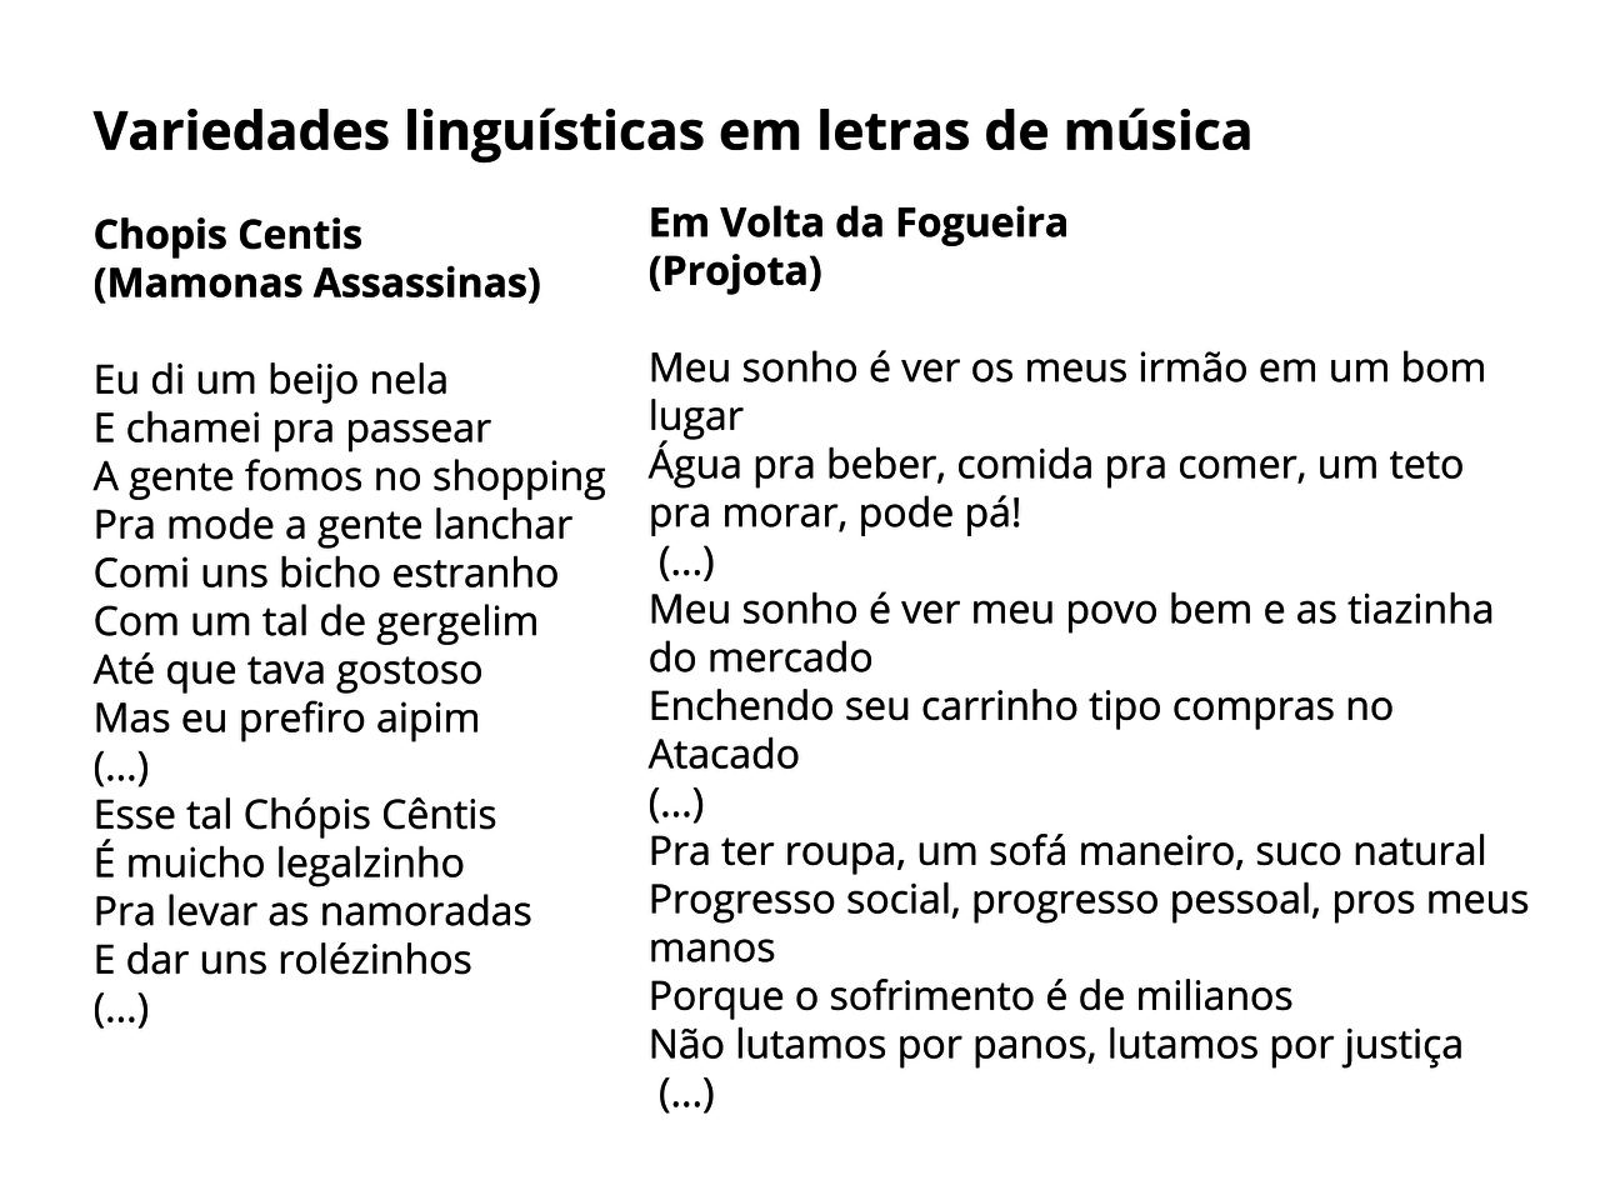 Variedades da língua  portuguesa